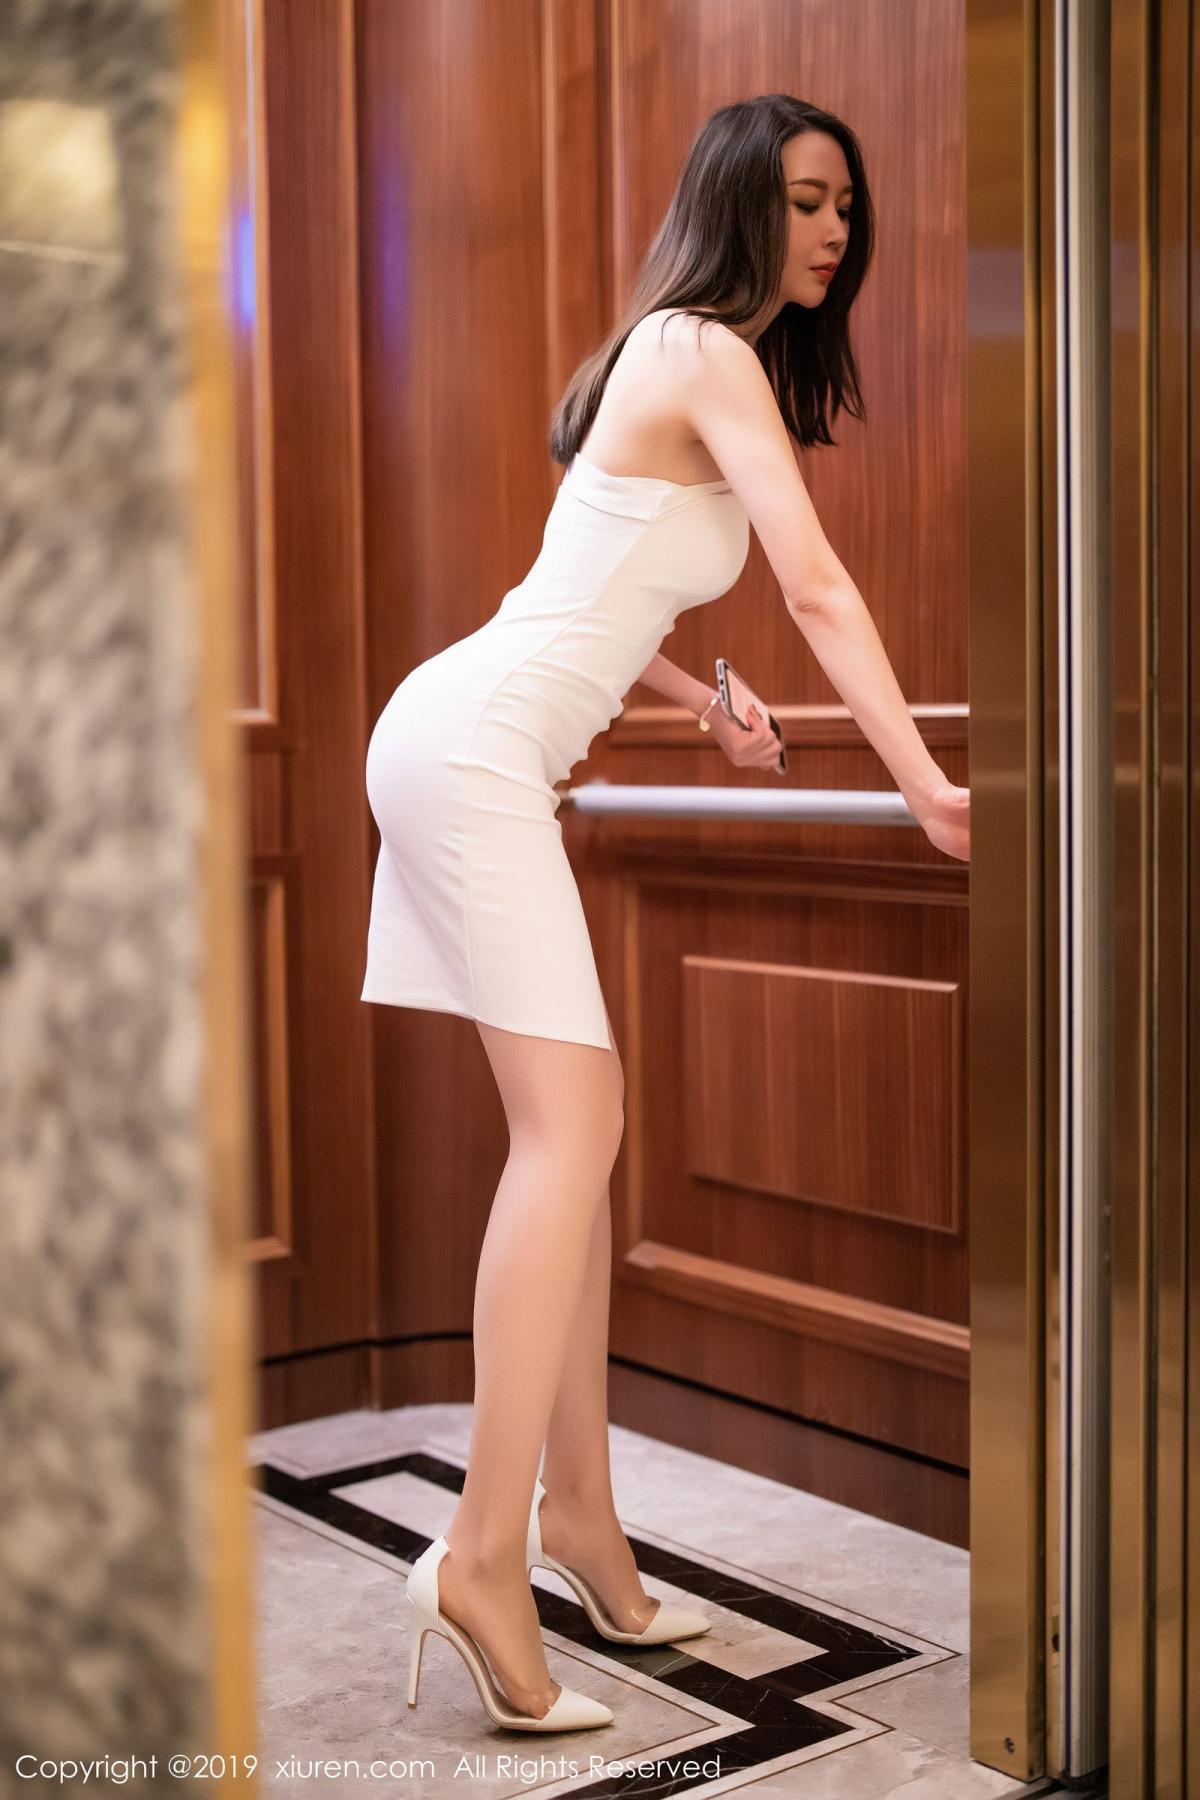 [XiuRen] Vol.1861 Meng Xin Yue 43P, Meng Xin Yue, Tall, Temperament, Uniform, Xiuren